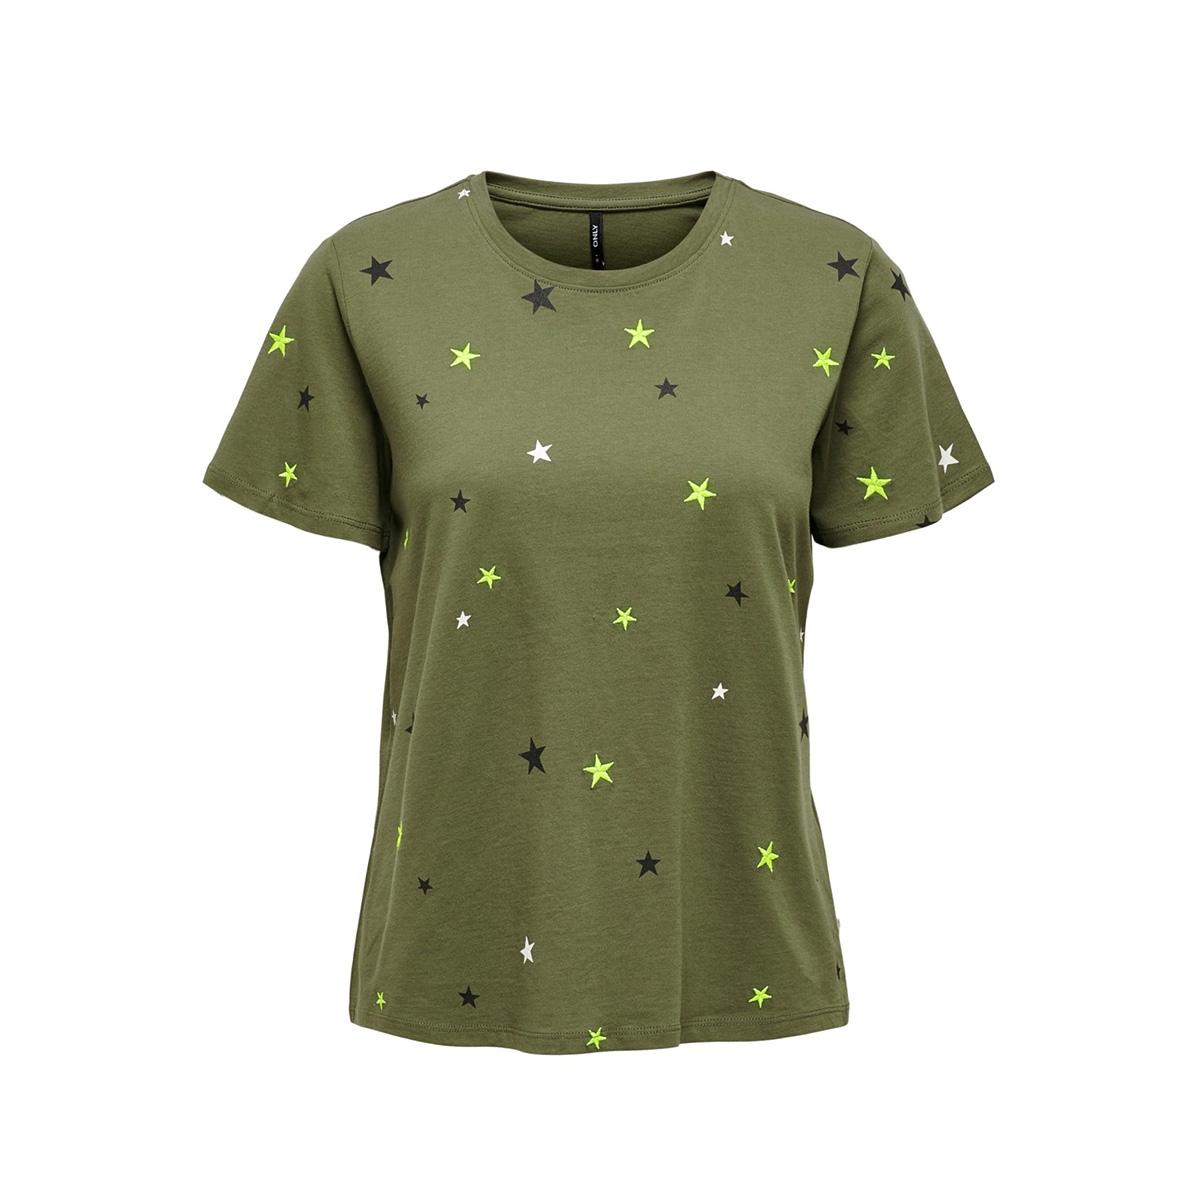 onlkita s/s star/dot top box jrs 15218041 only t-shirt kalamata/star